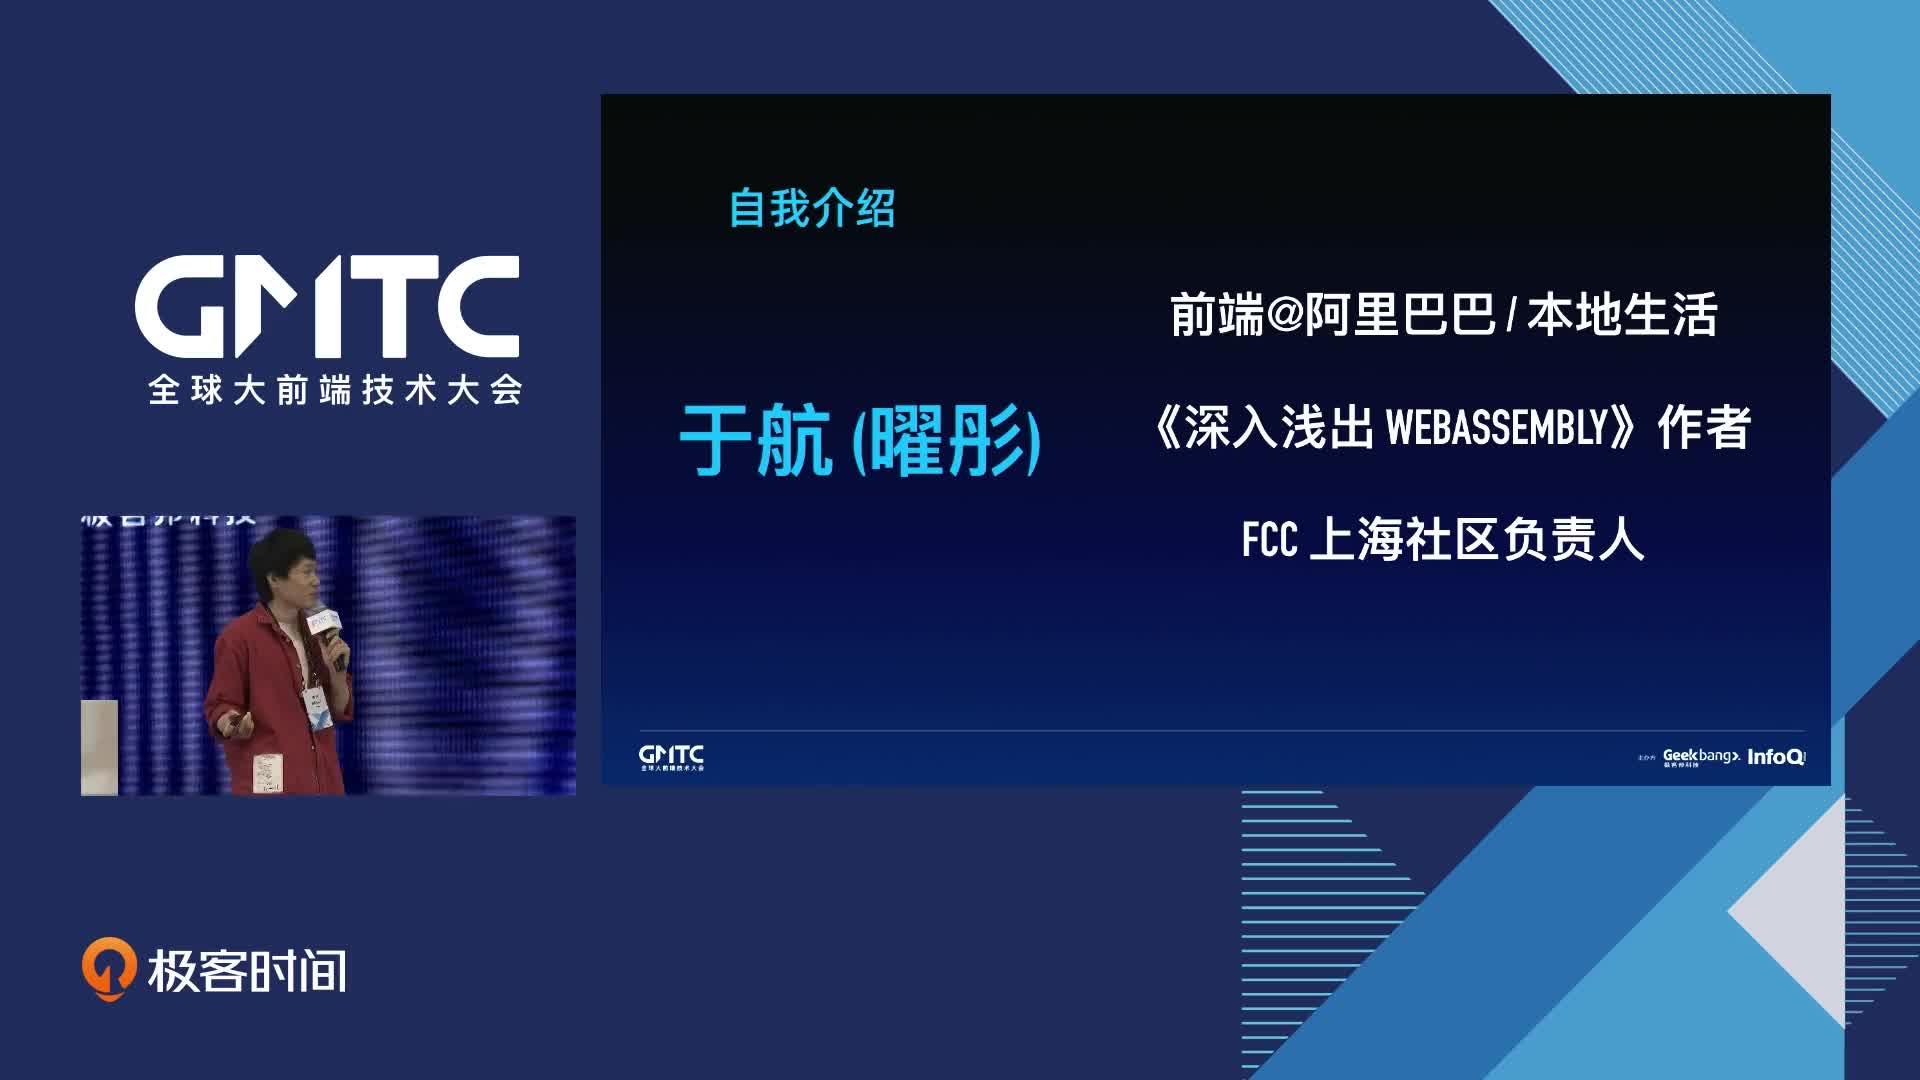 WebAssembly — 技术变革,未来已来丨GMTC